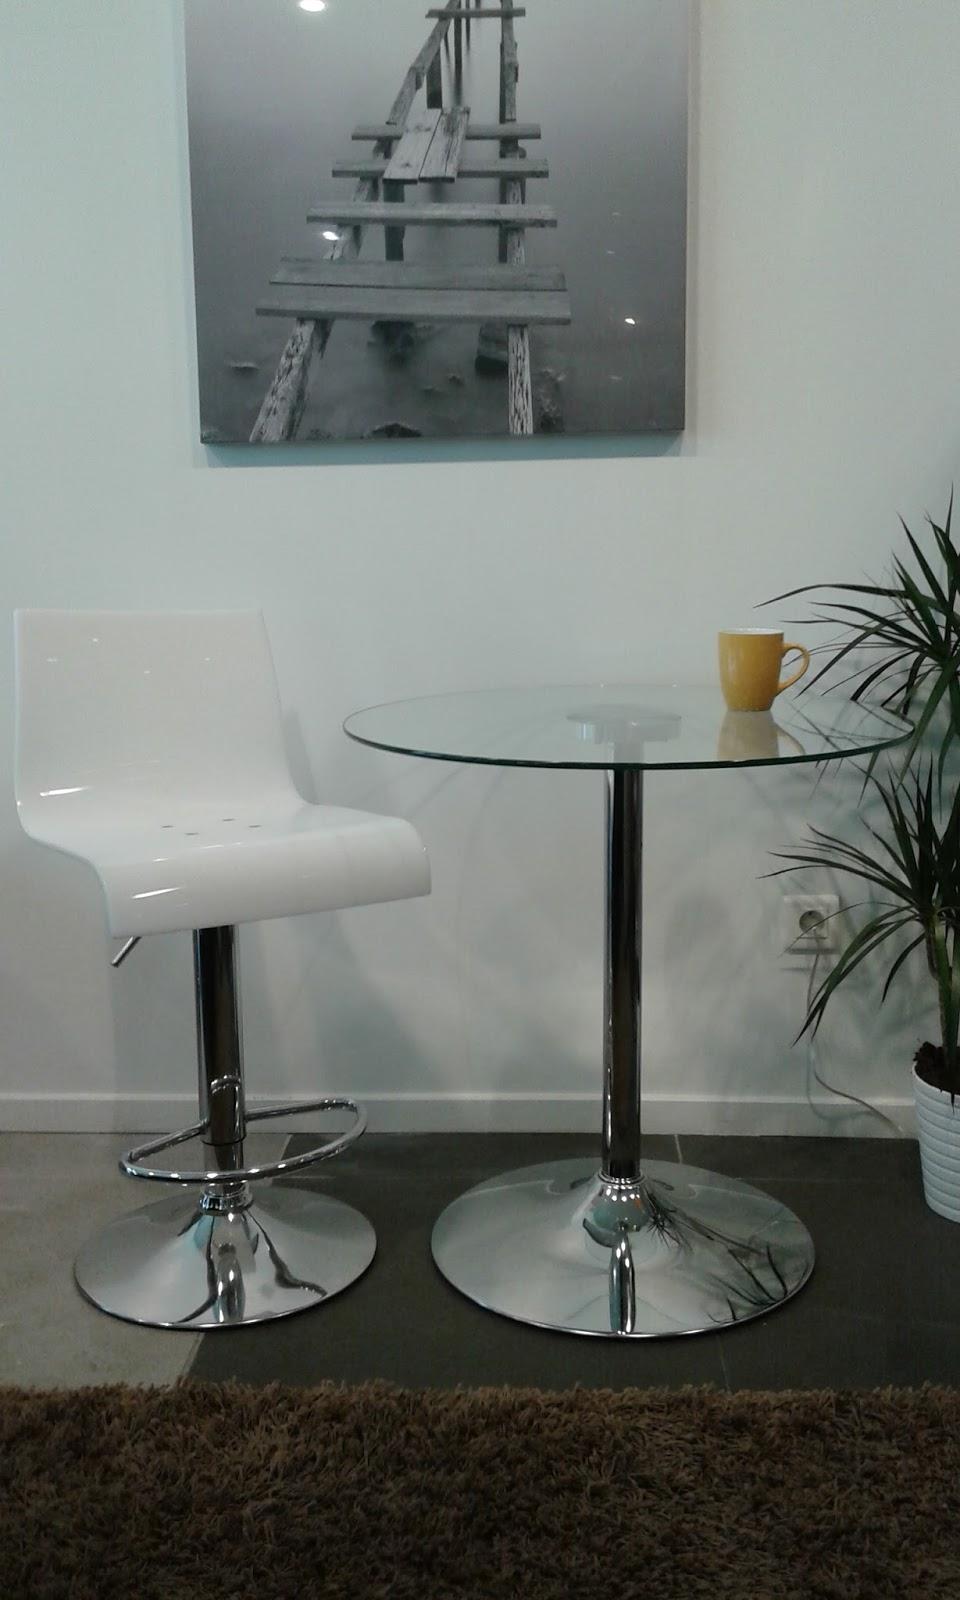 tables et jeux de soci t. Black Bedroom Furniture Sets. Home Design Ideas